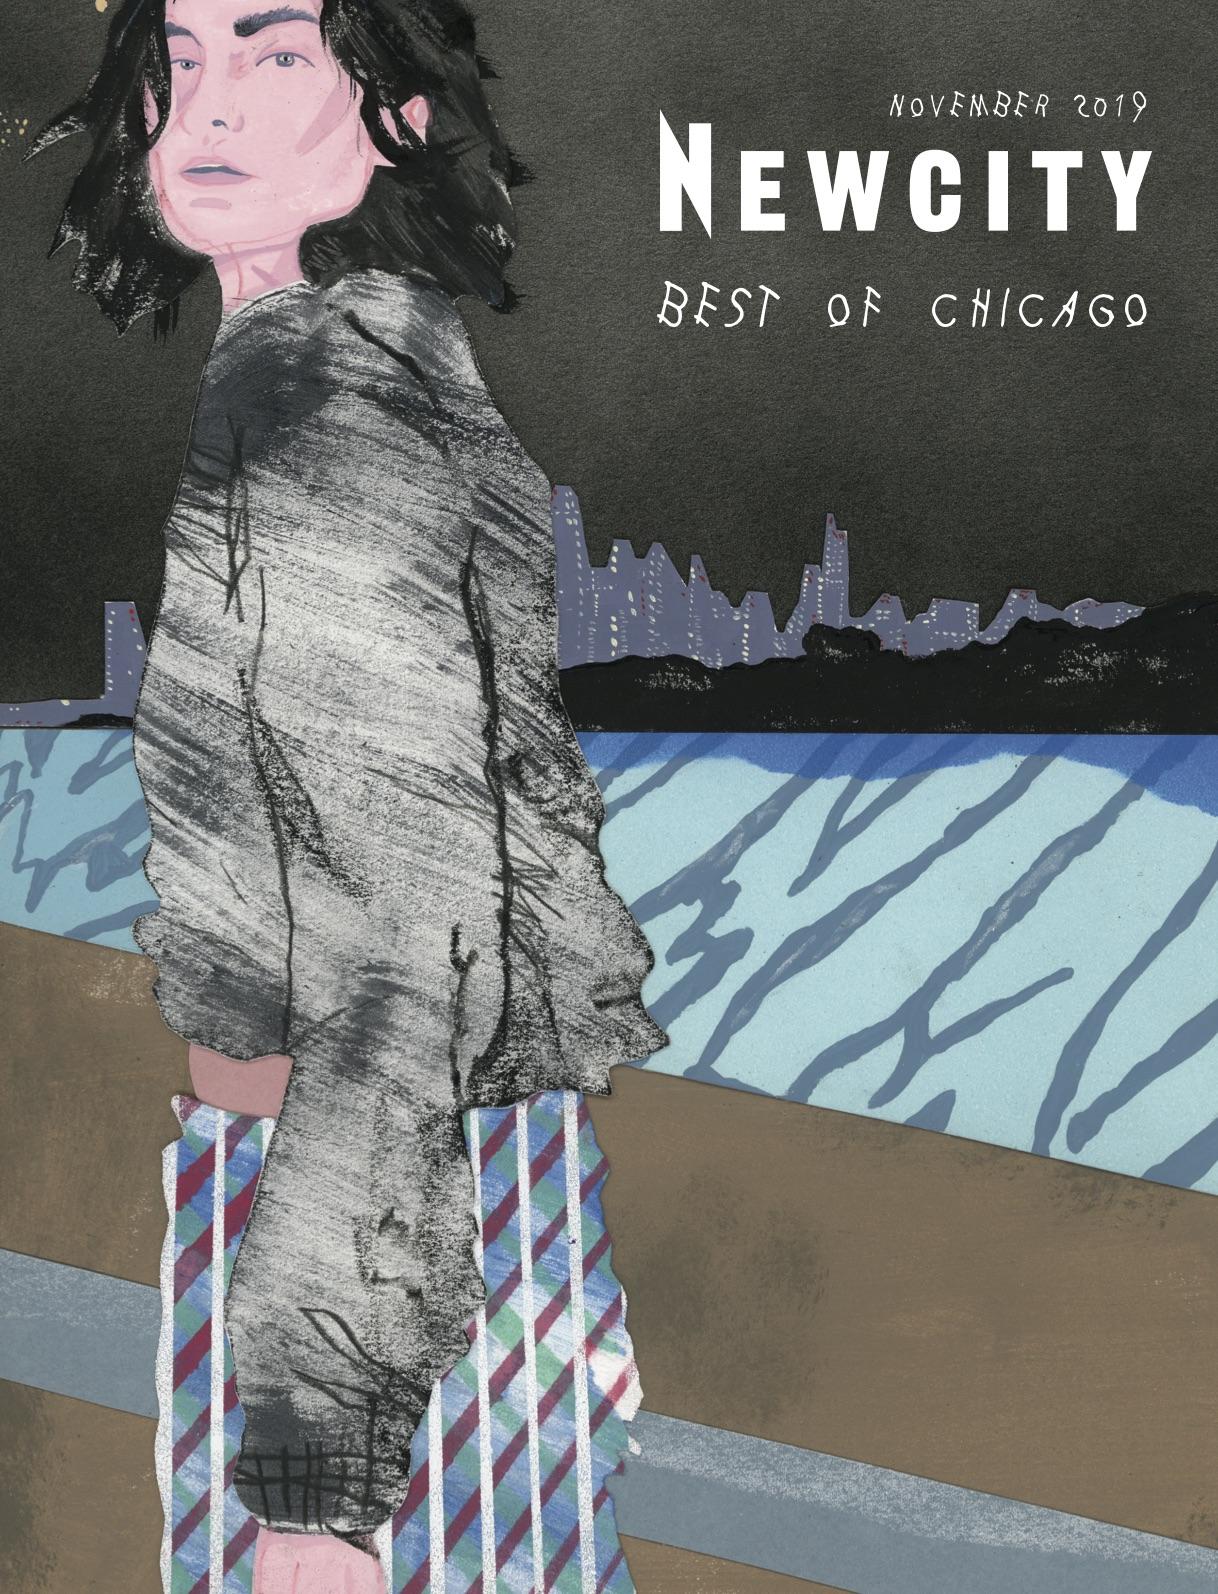 Newcity_November2019